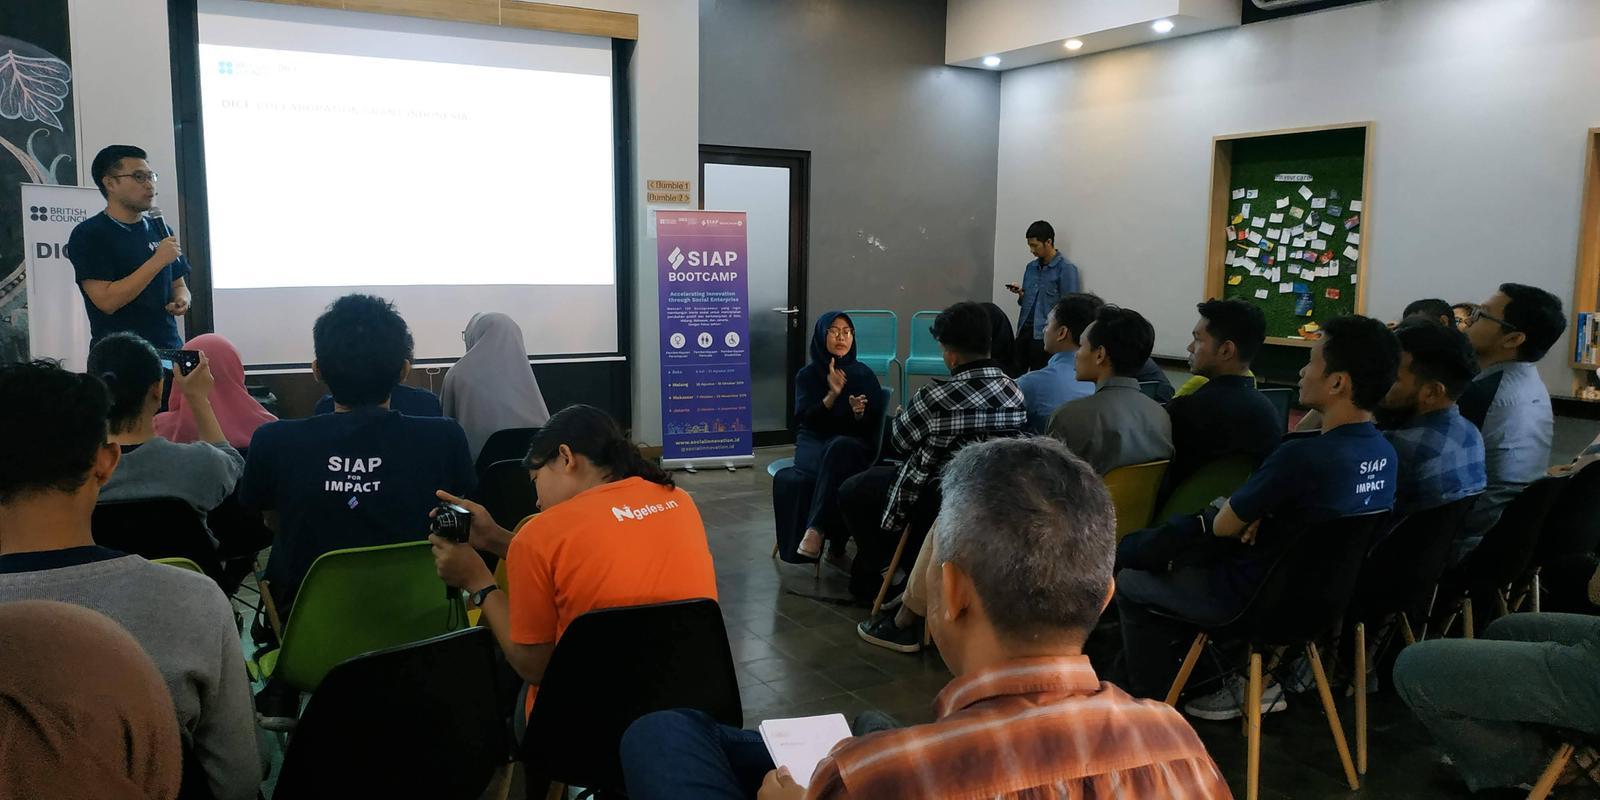 SIAP Bootcamp